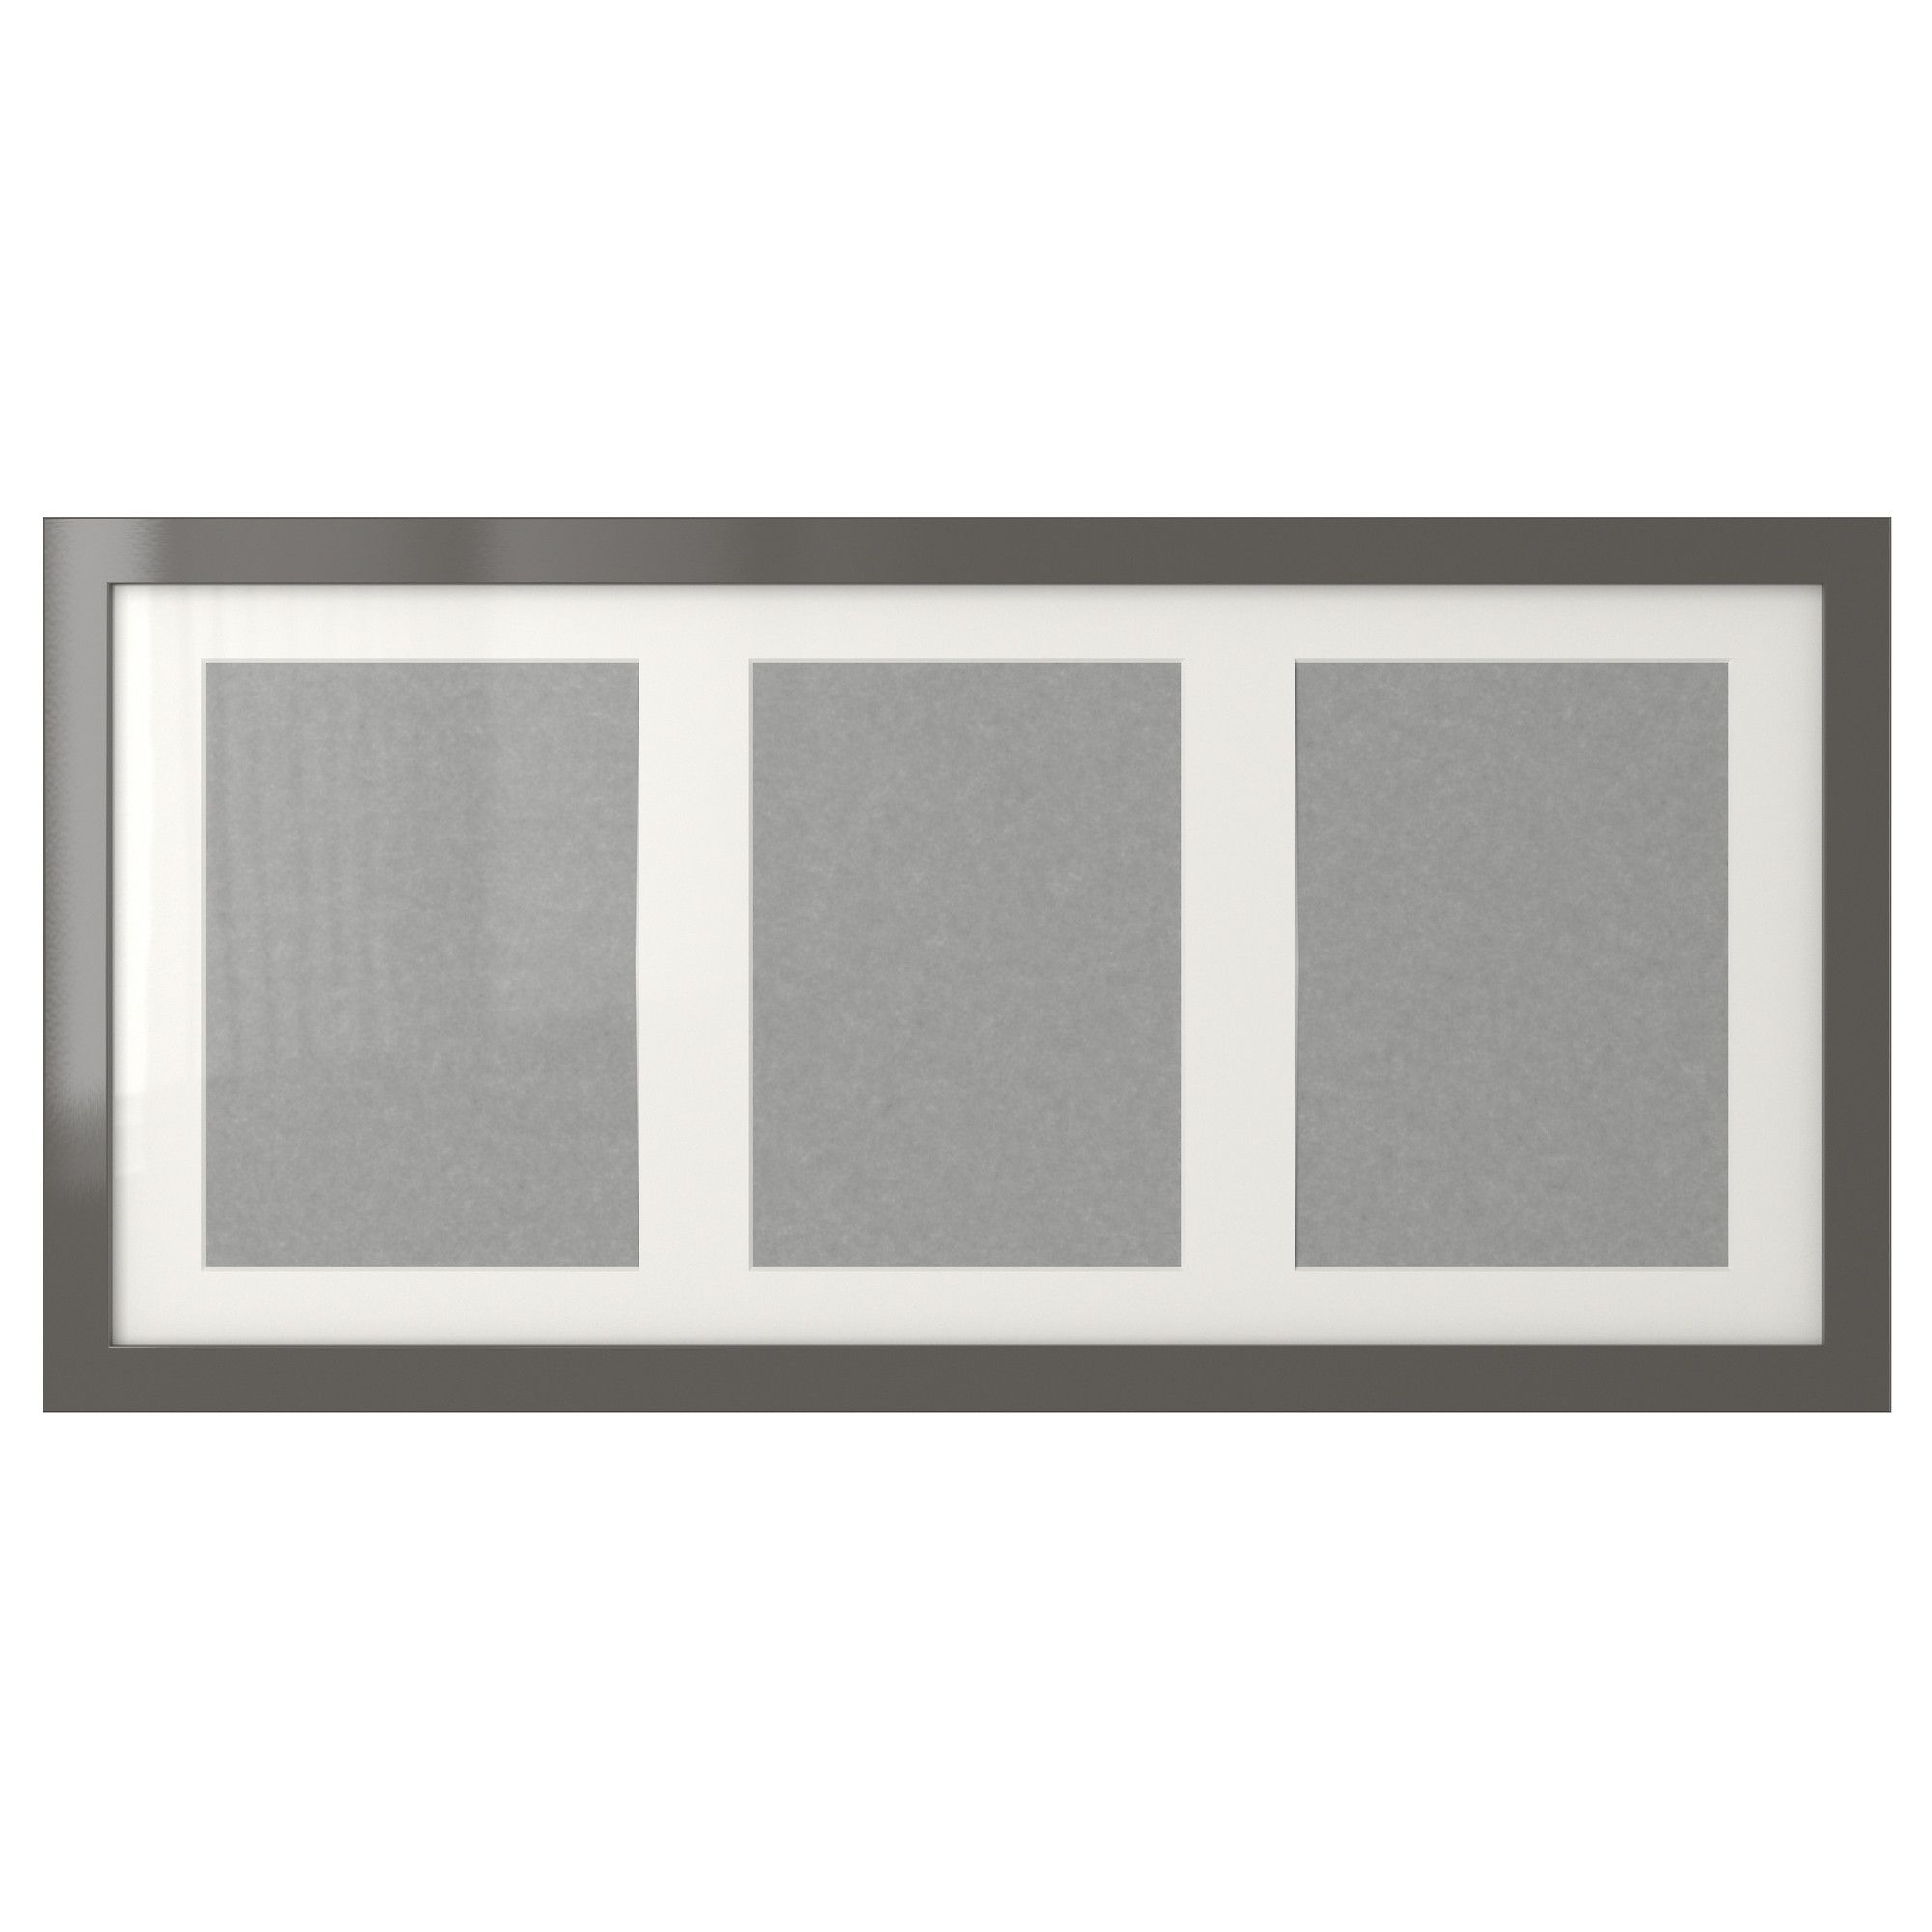 RIBBA Frame - high gloss/gray - IKEA | New Midtown Pad | Pinterest ...